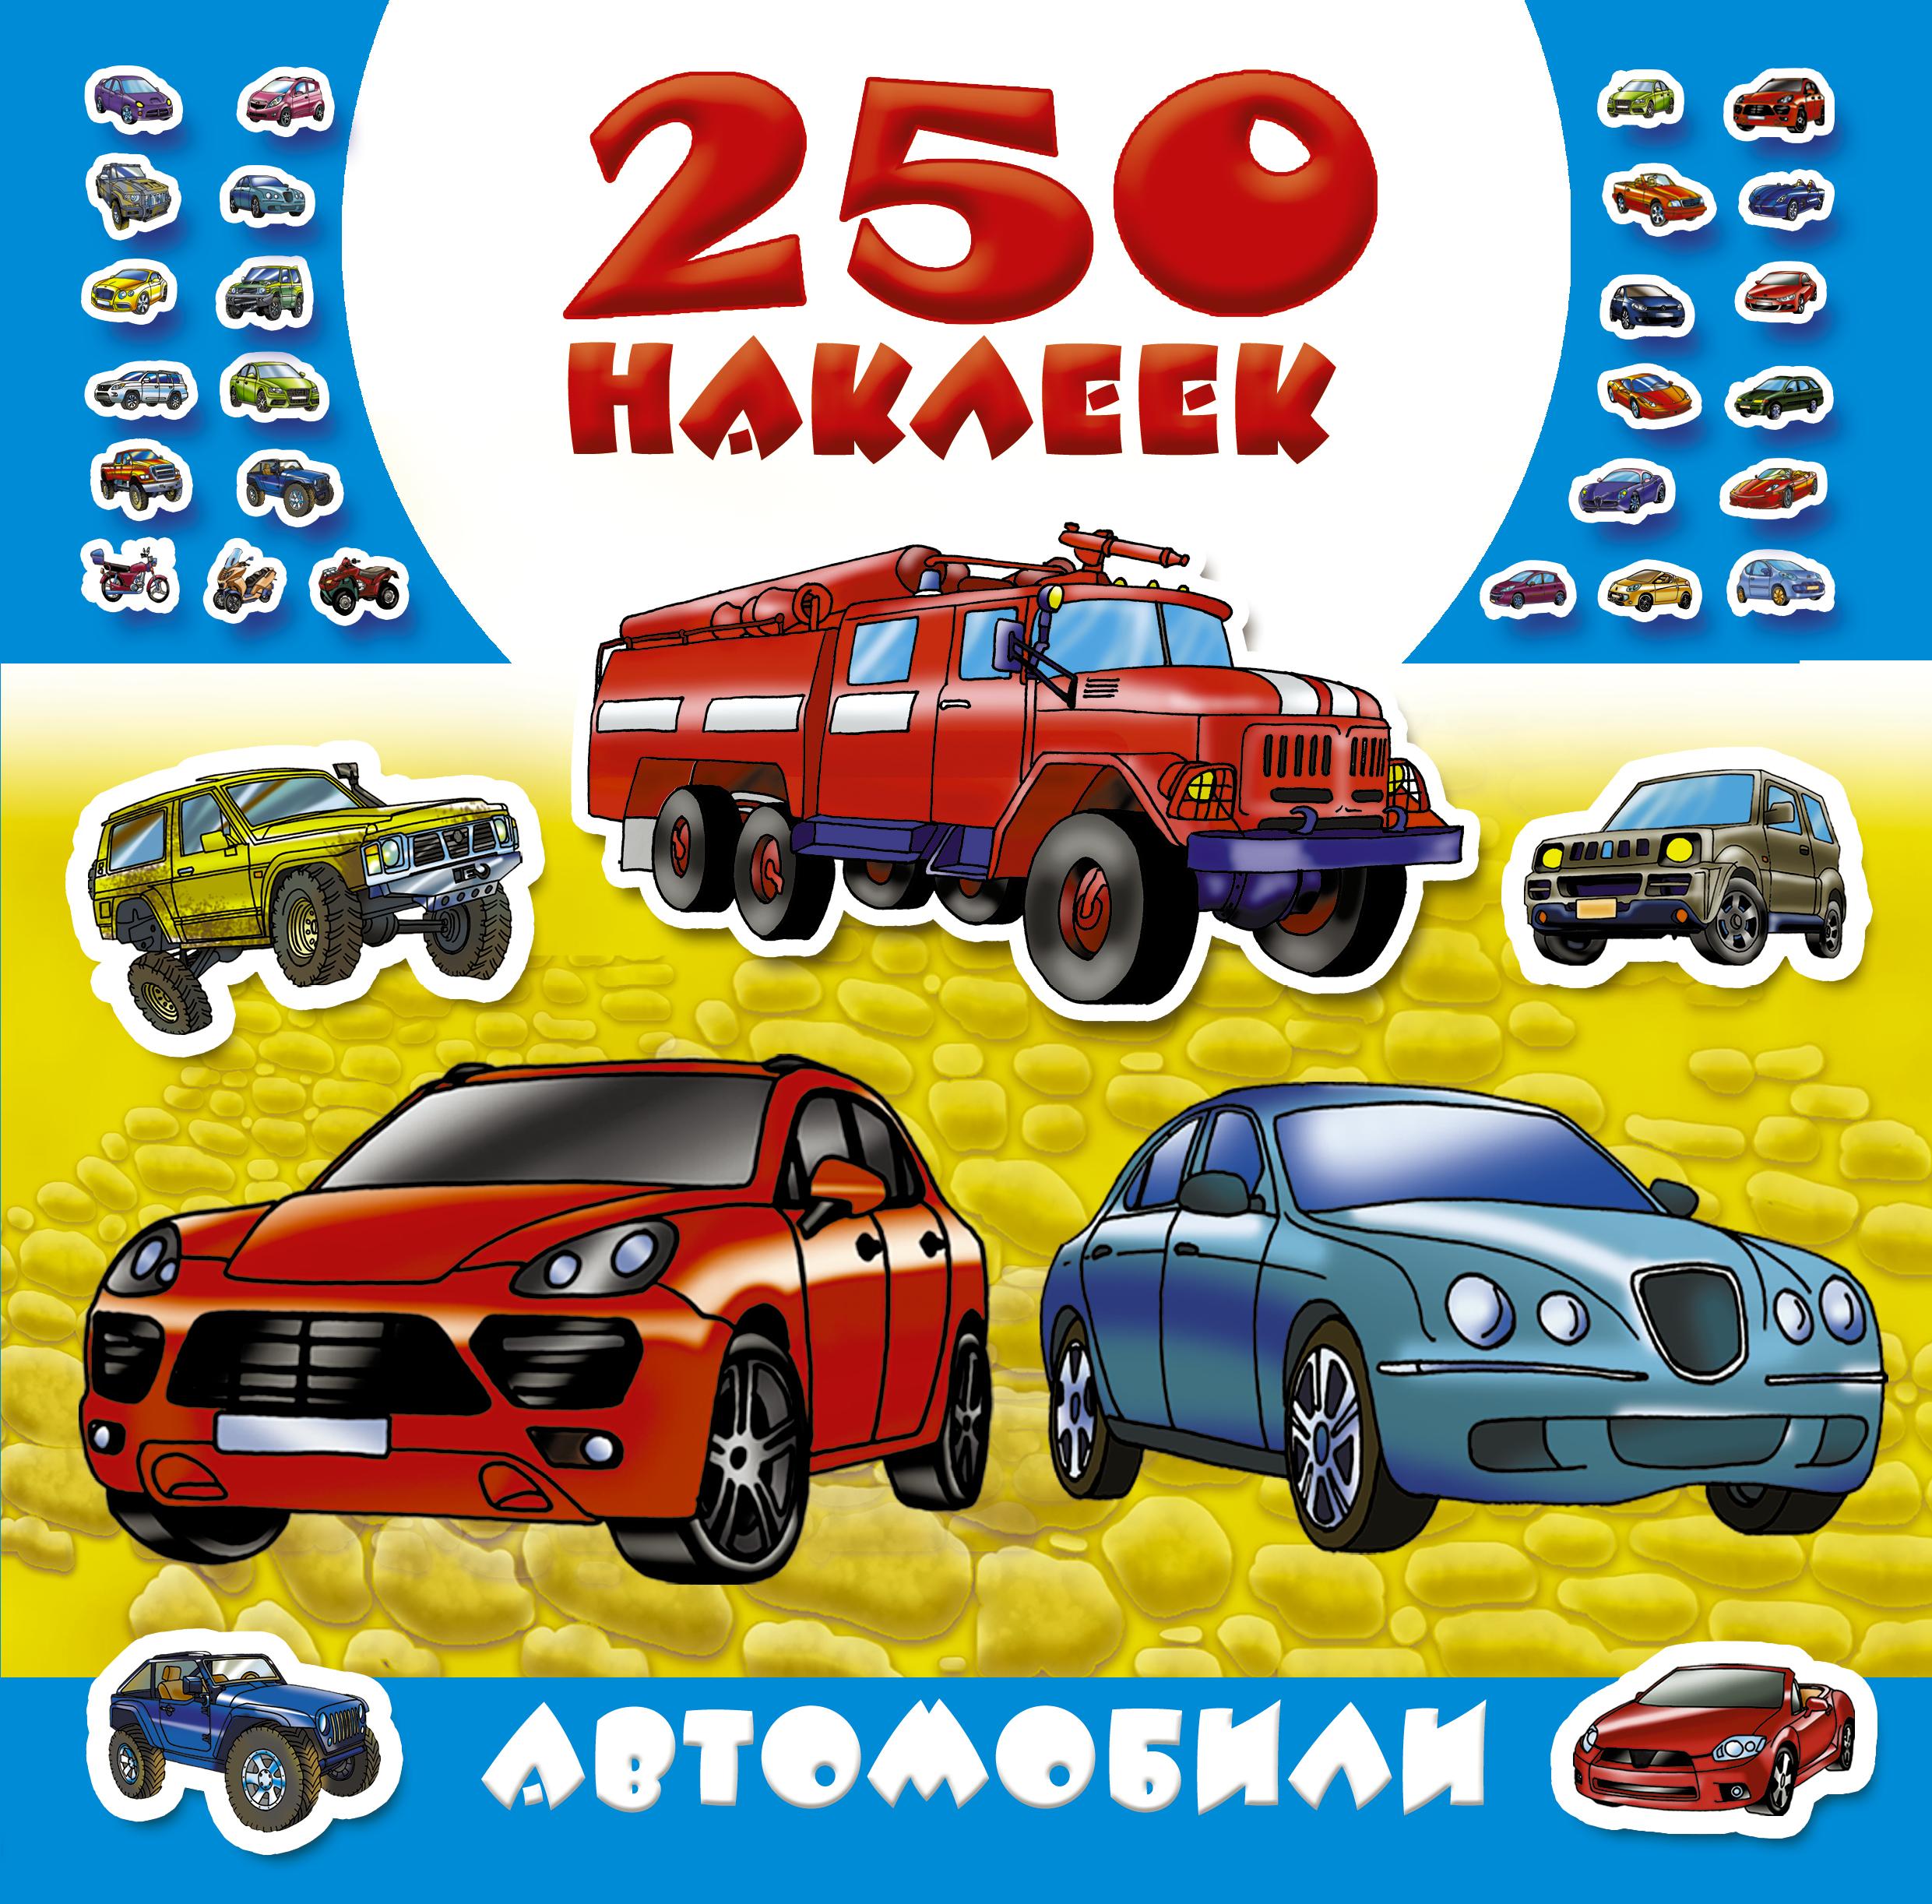 Рахманов А., Глотова В.Ю. Автомобили глотова в рахманов а илл в мире животных 500 наклеек